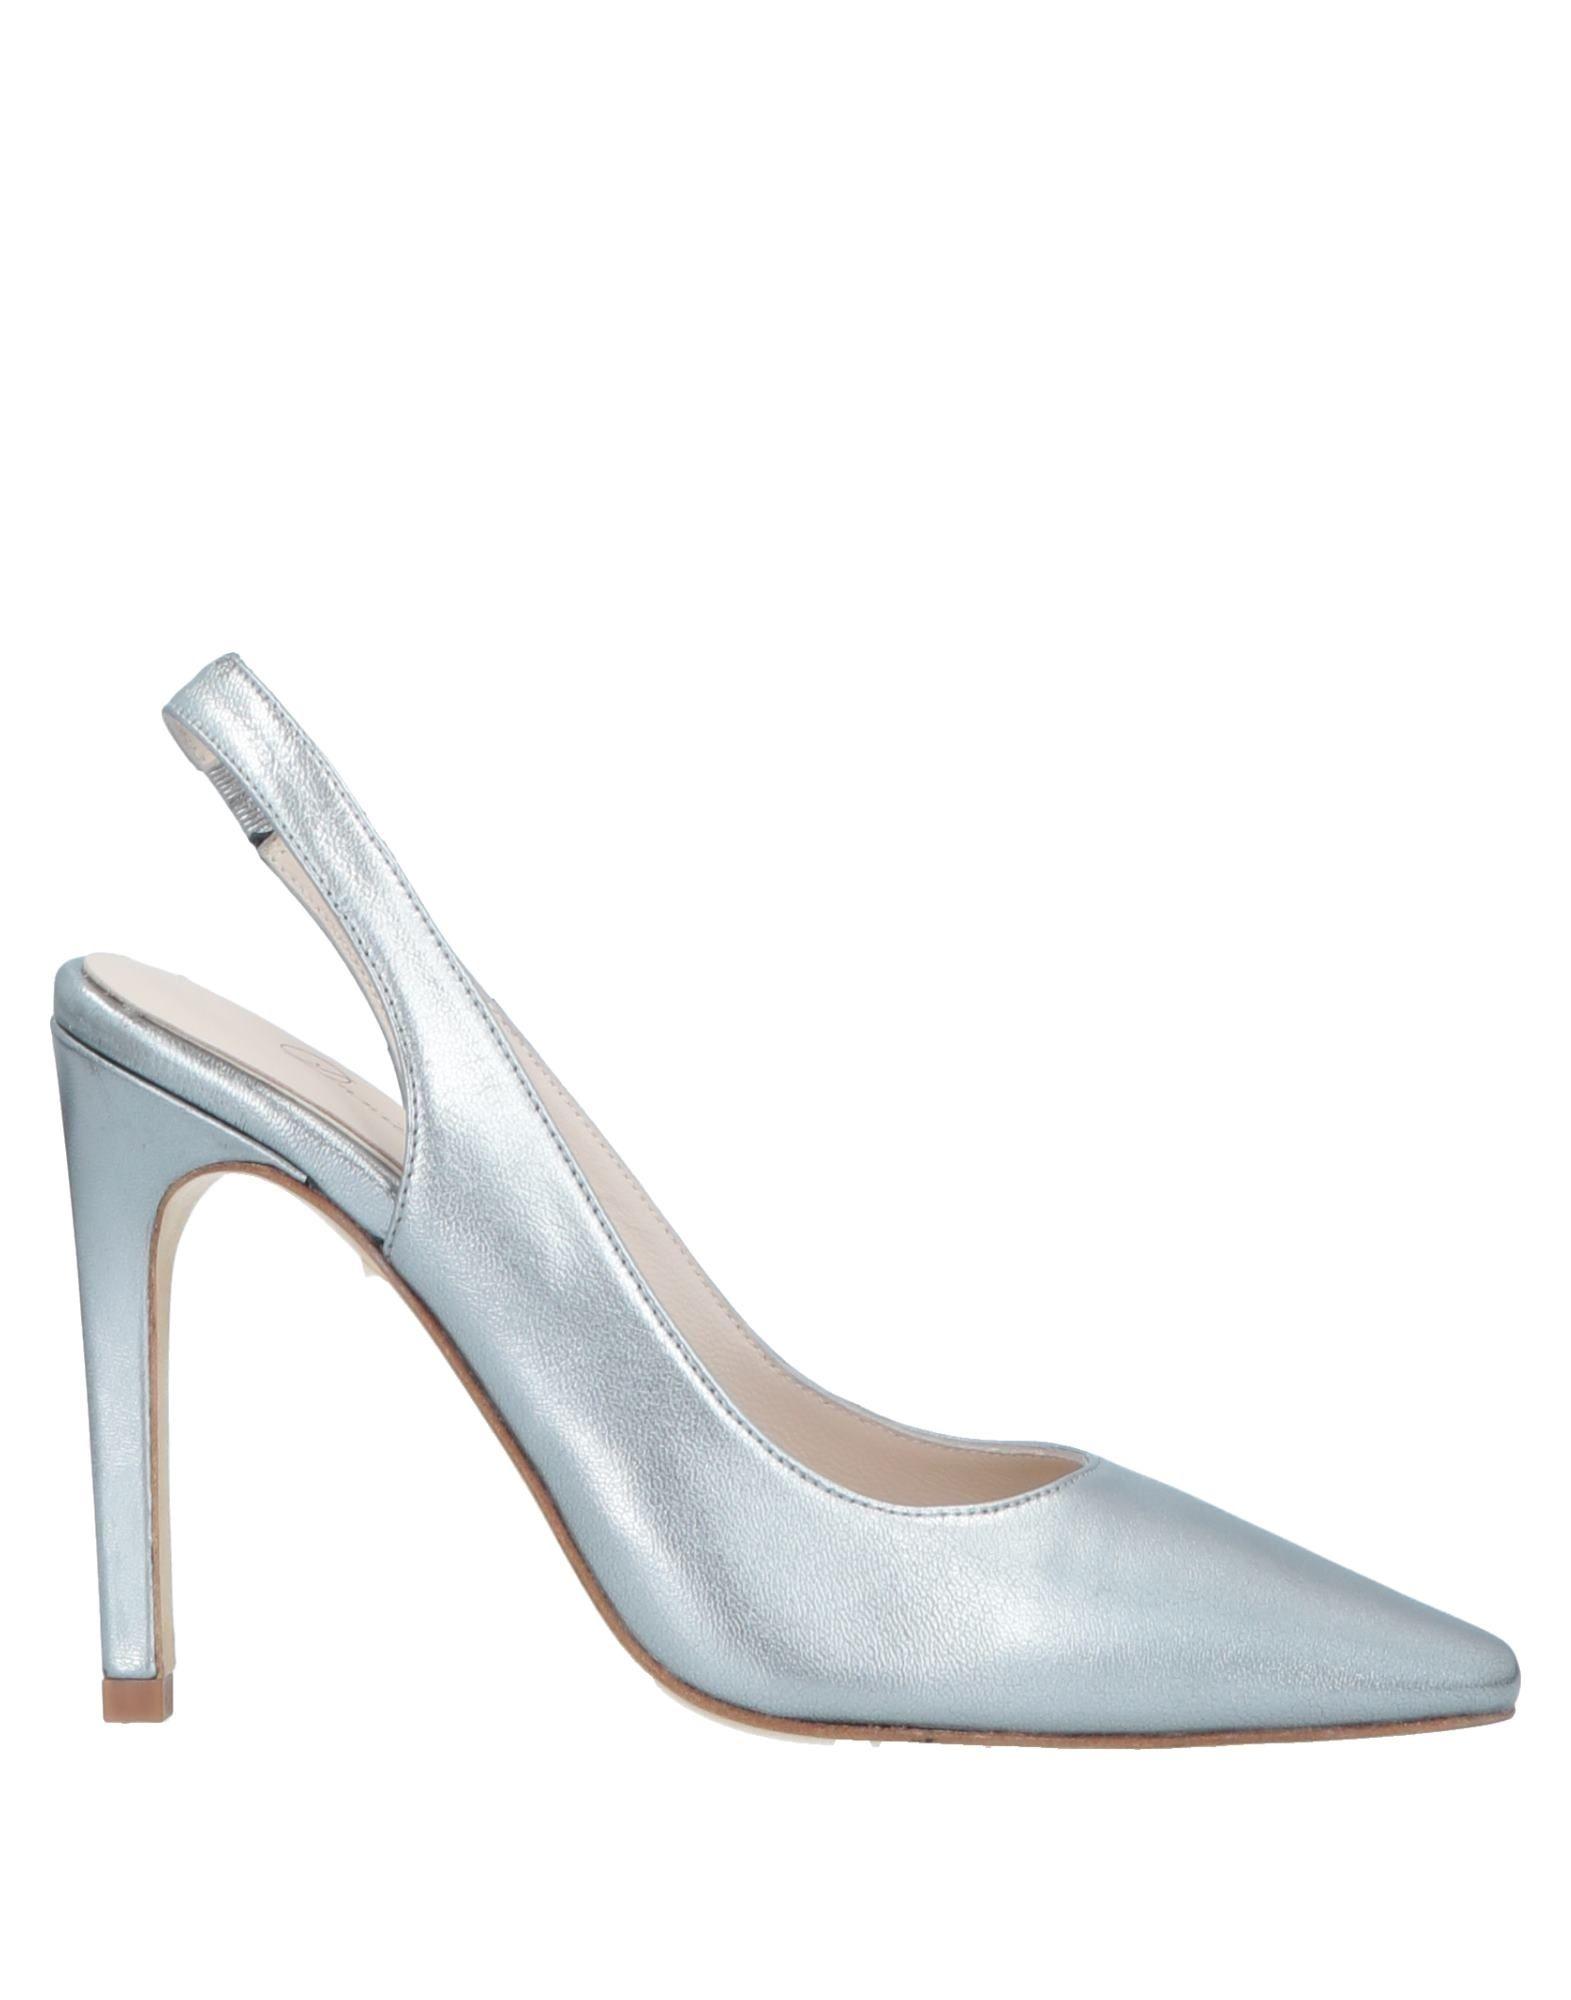 Plata Zapato De Salón Daniele Ancarani Mujer - Salones Salones Salones Daniele Ancarani Tiempo limitado especial c2444b